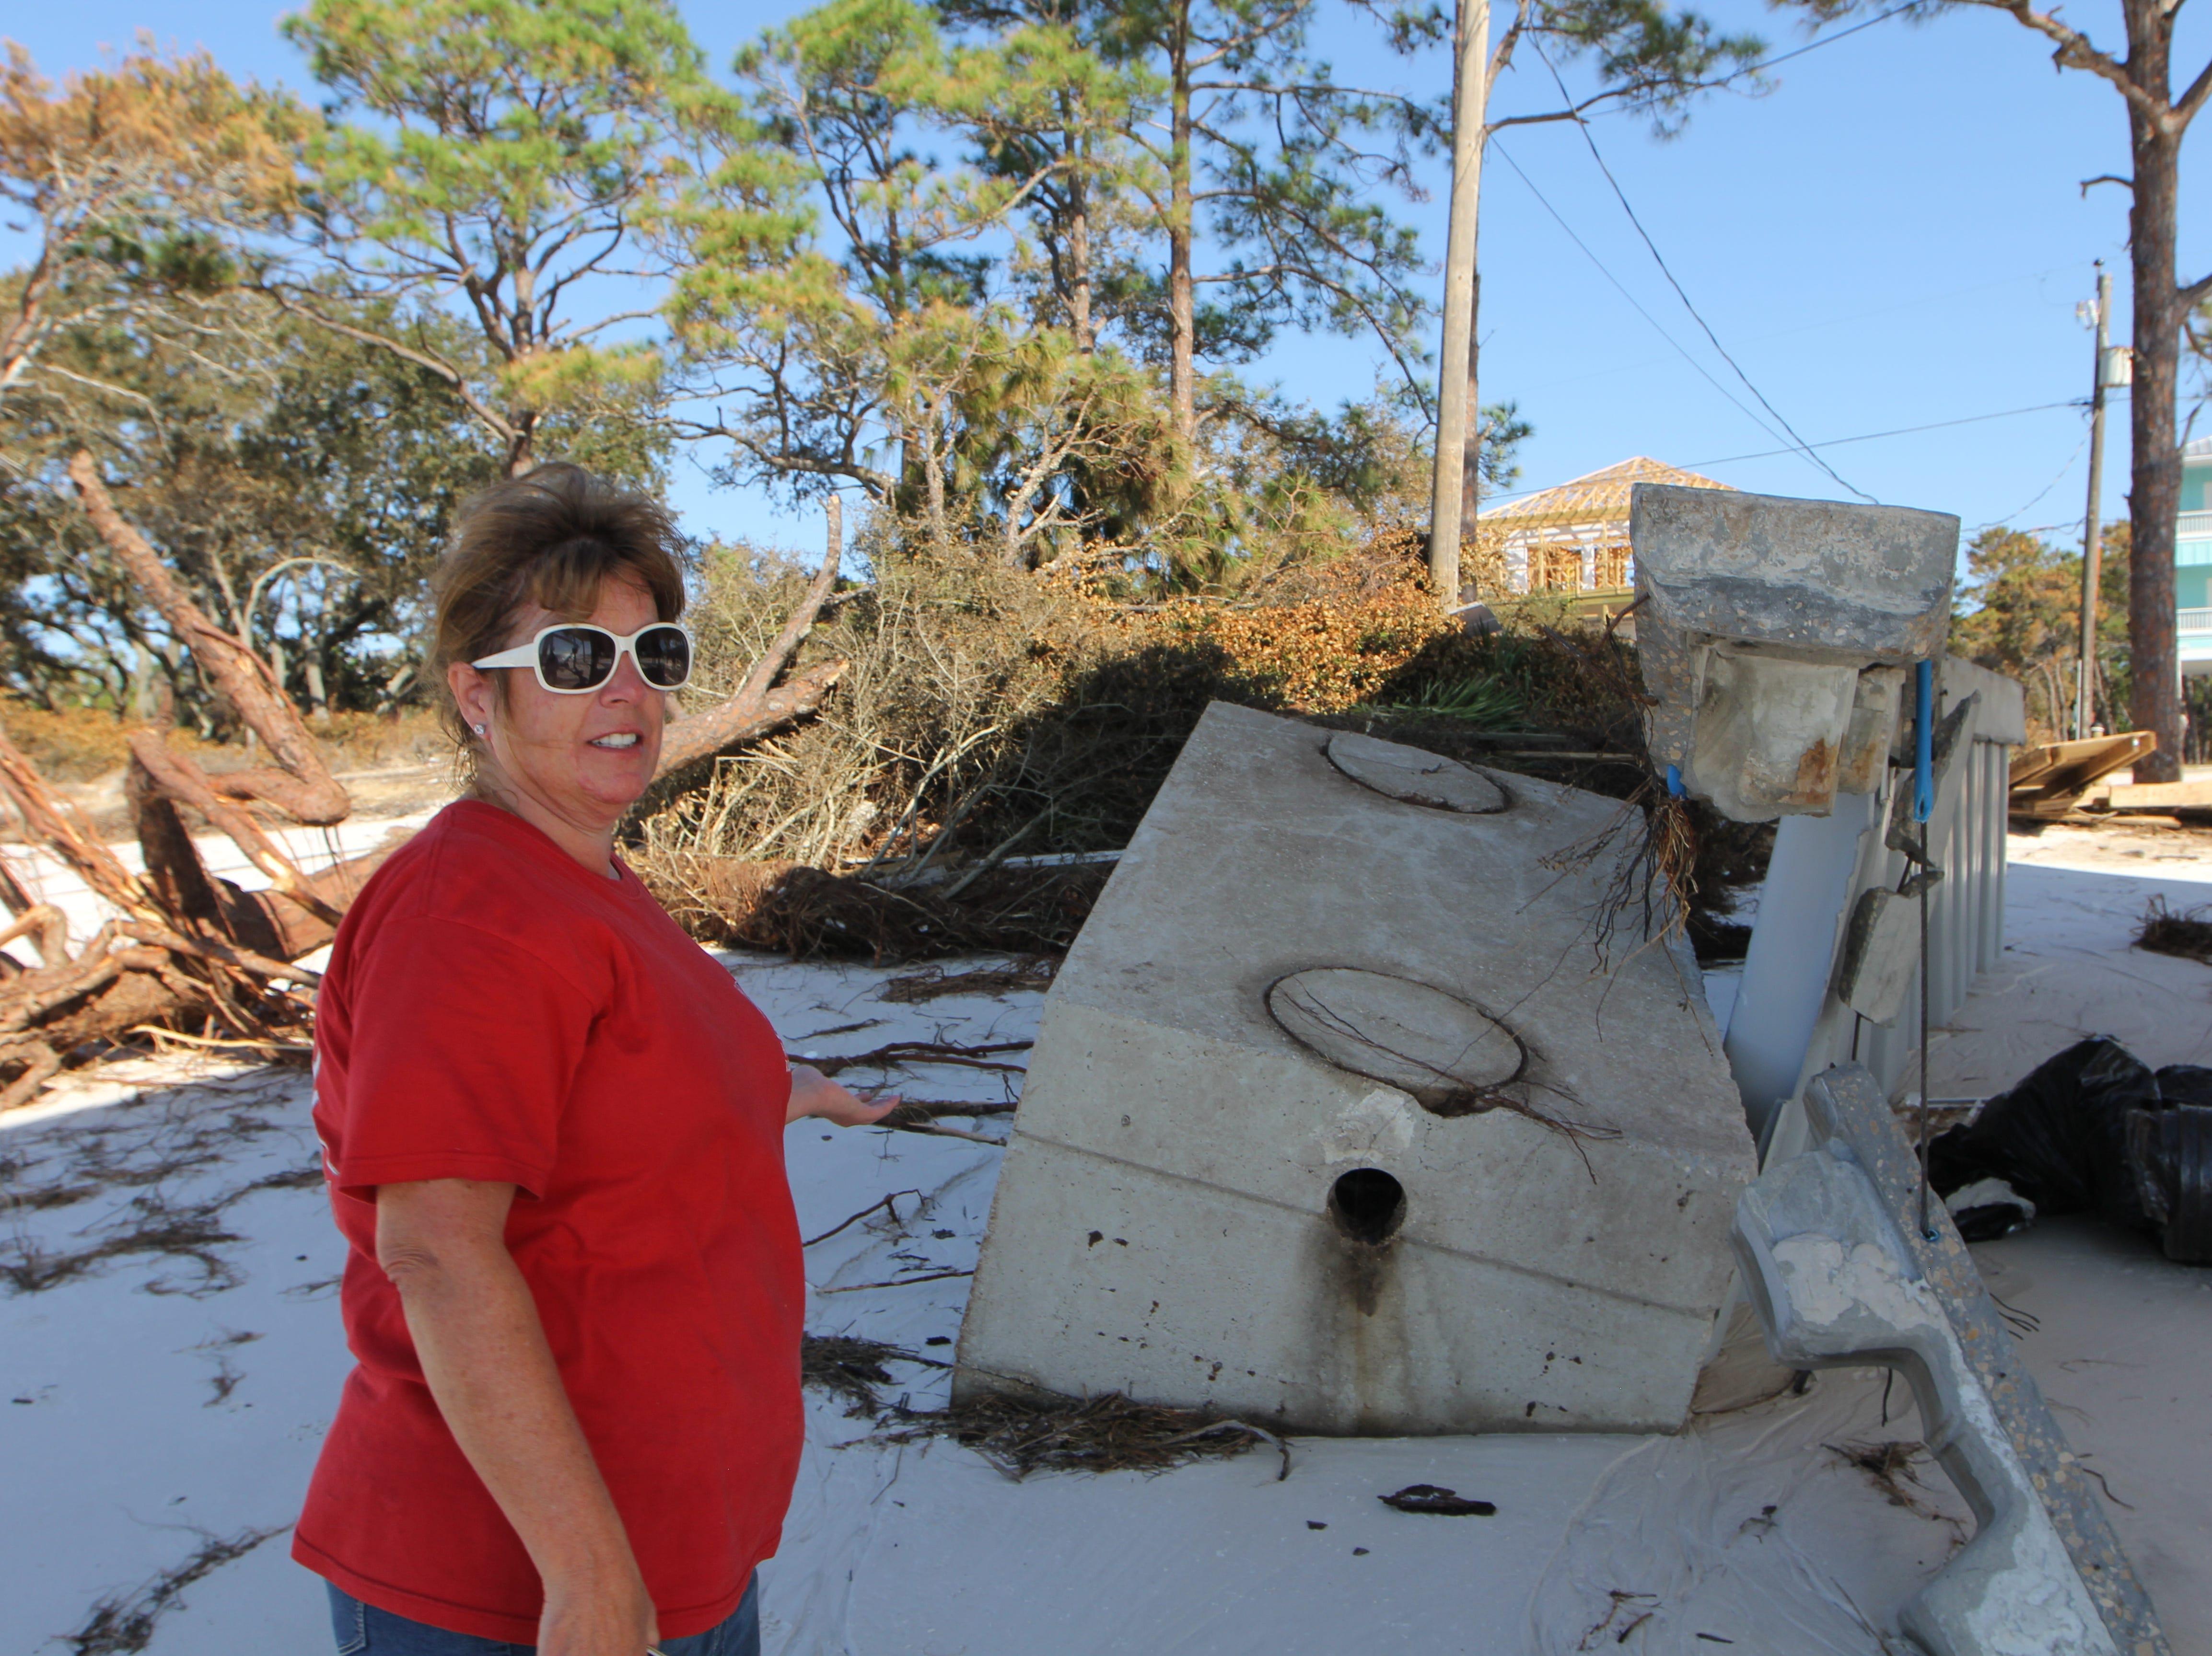 Tonia McNabb's house on Alligator Point sustained major damage during Hurricane Michael.